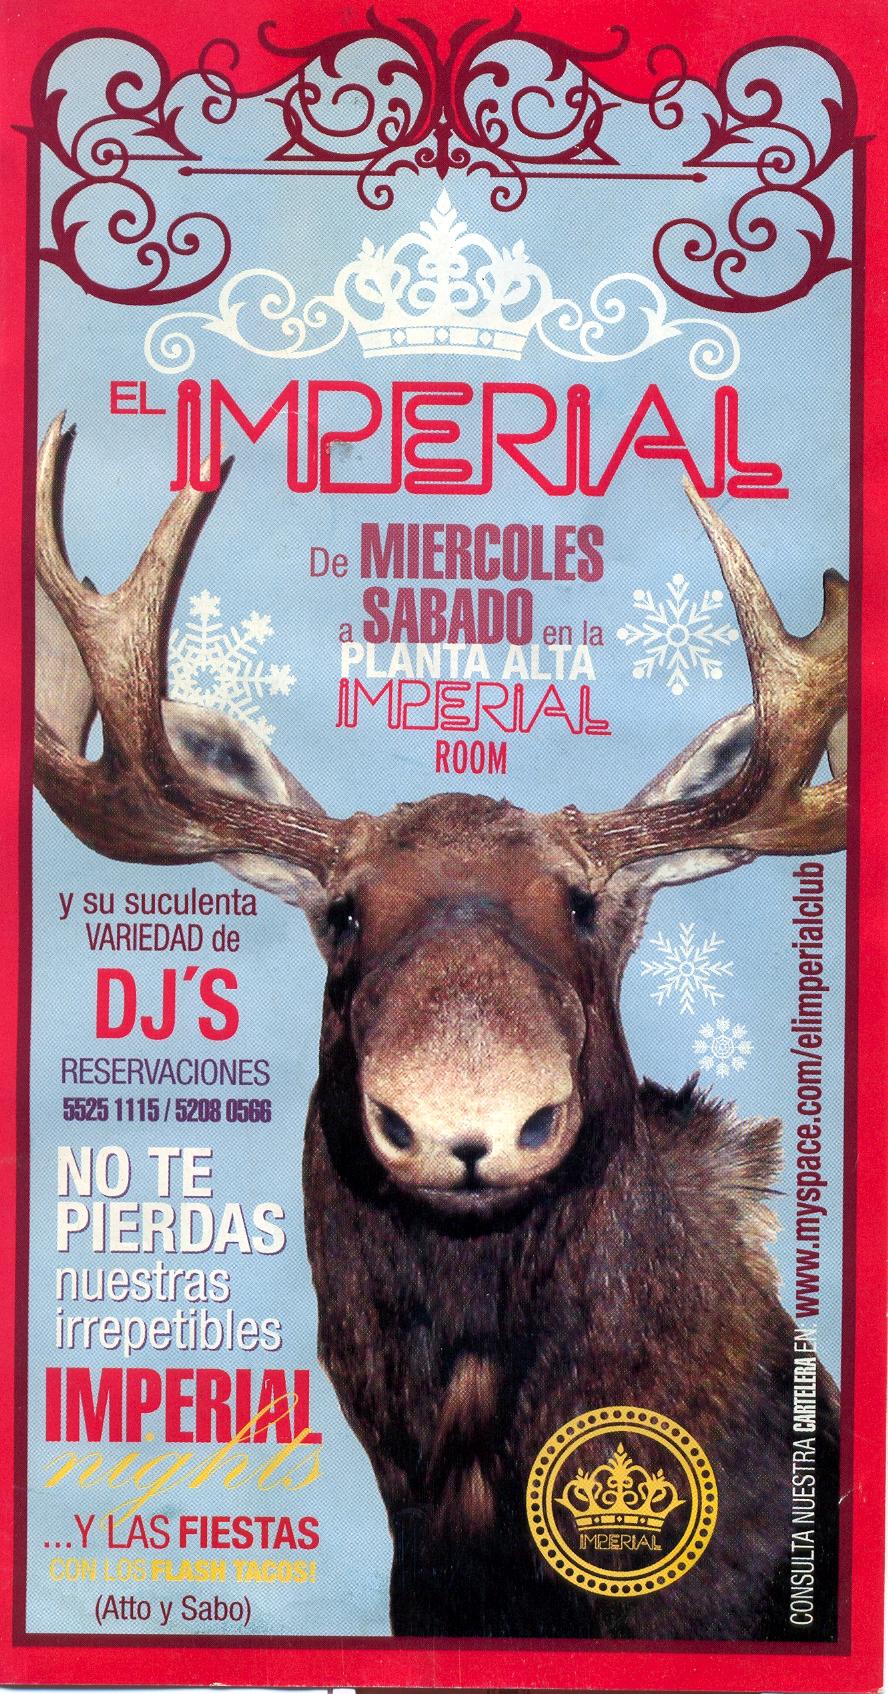 diciembre 2008 imperial